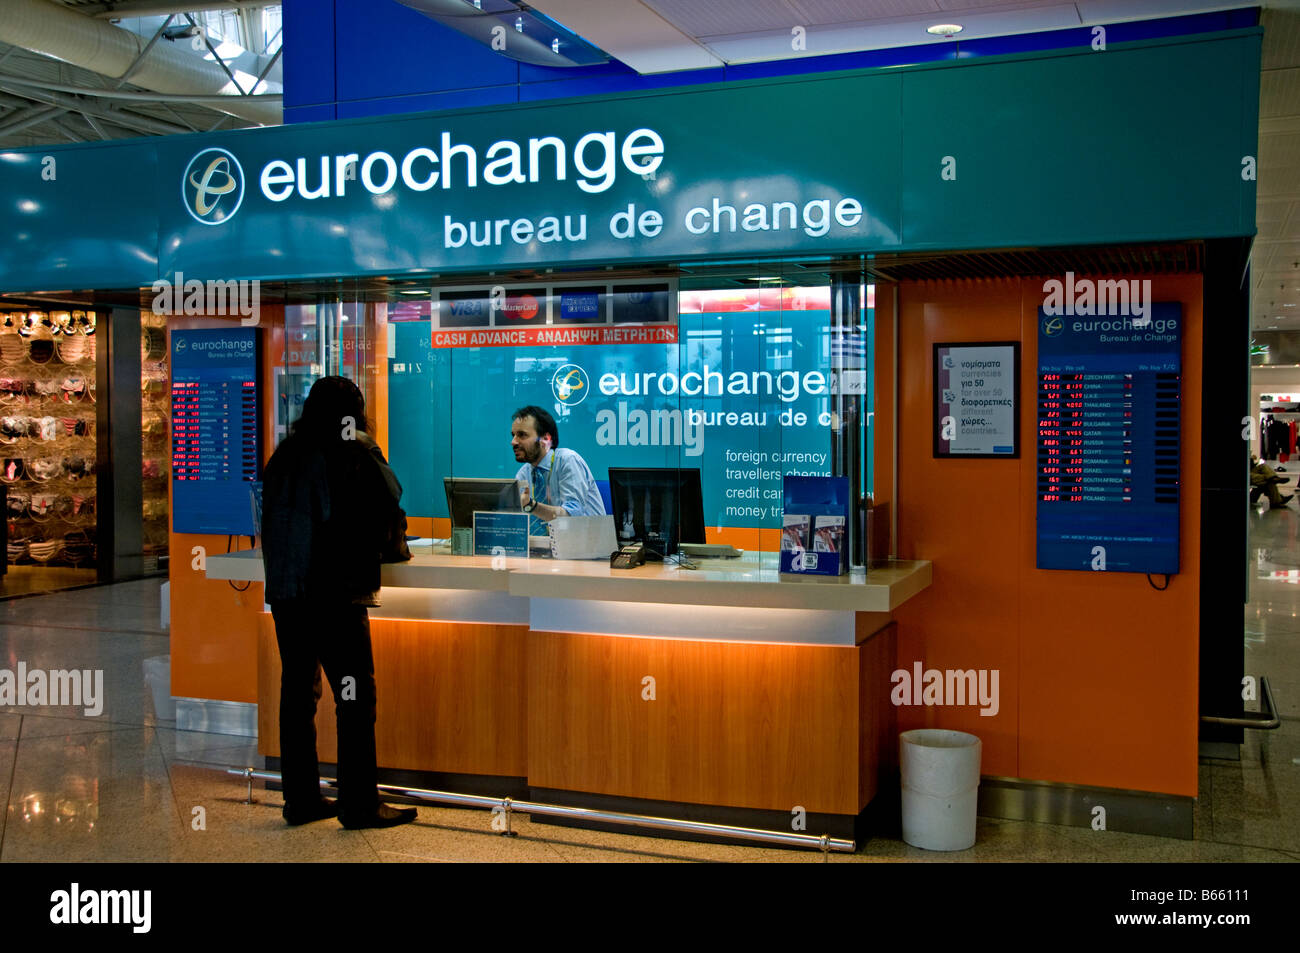 athens greece the eleftherios venizelos international airport eurochange bureau de change euro dollar pound yen